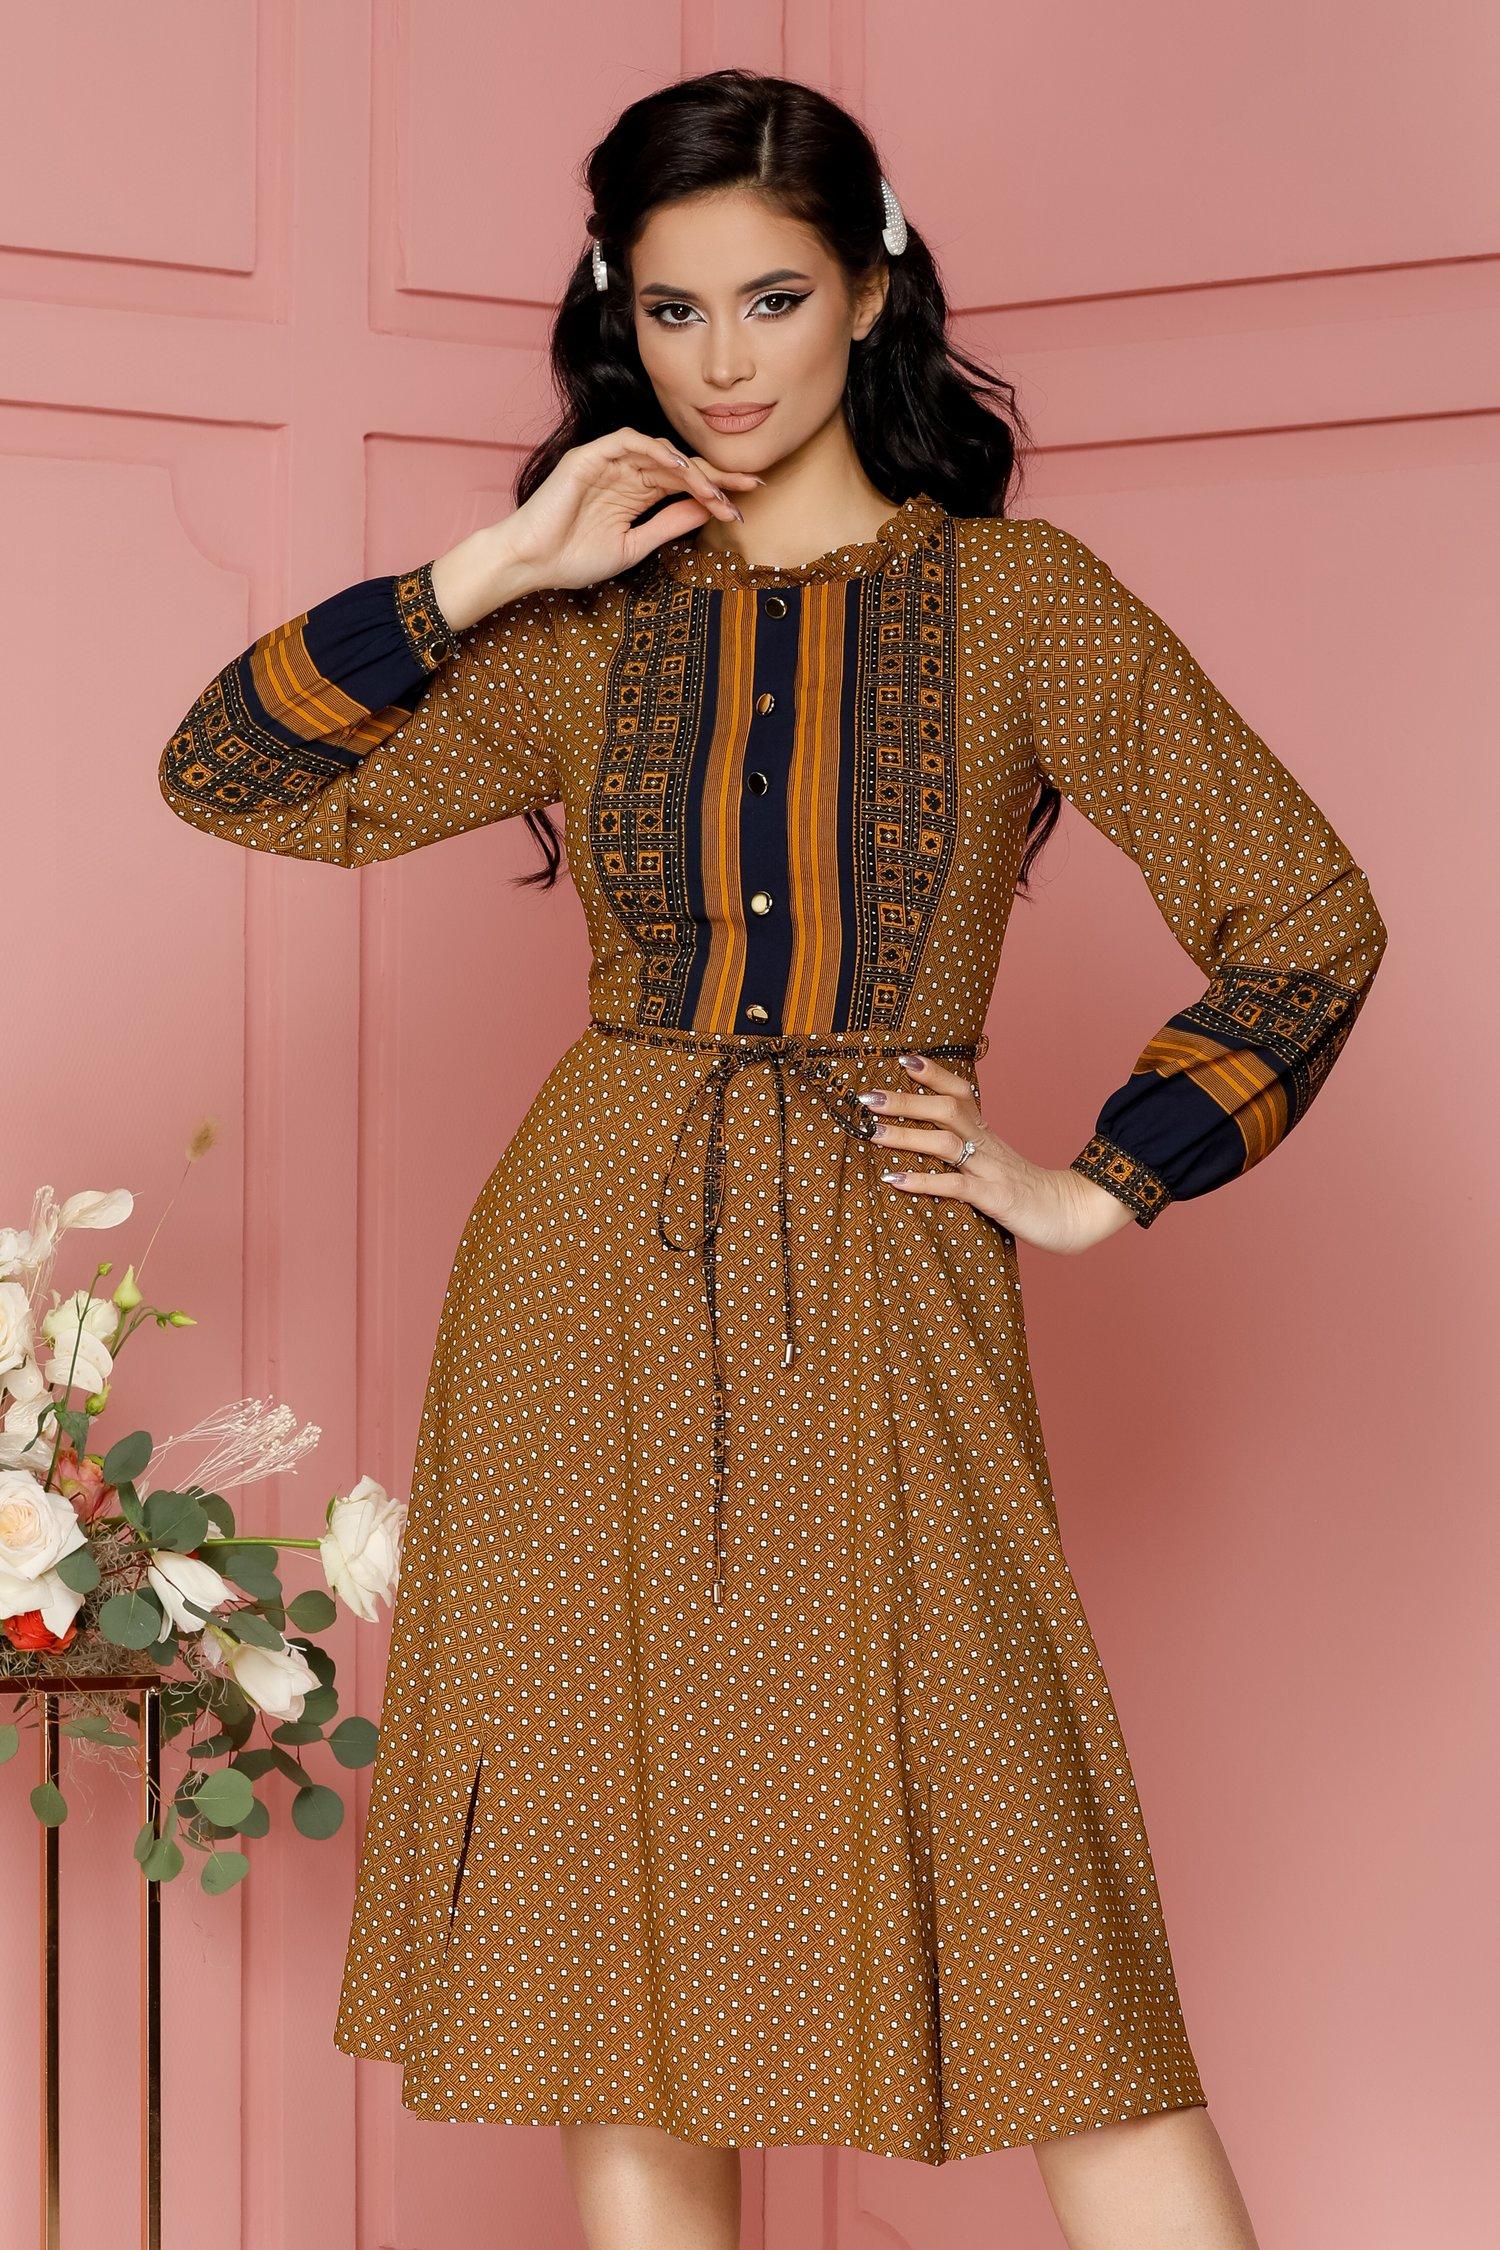 rochie leonard collection galben mustar cu imprimeu divers 486564 4